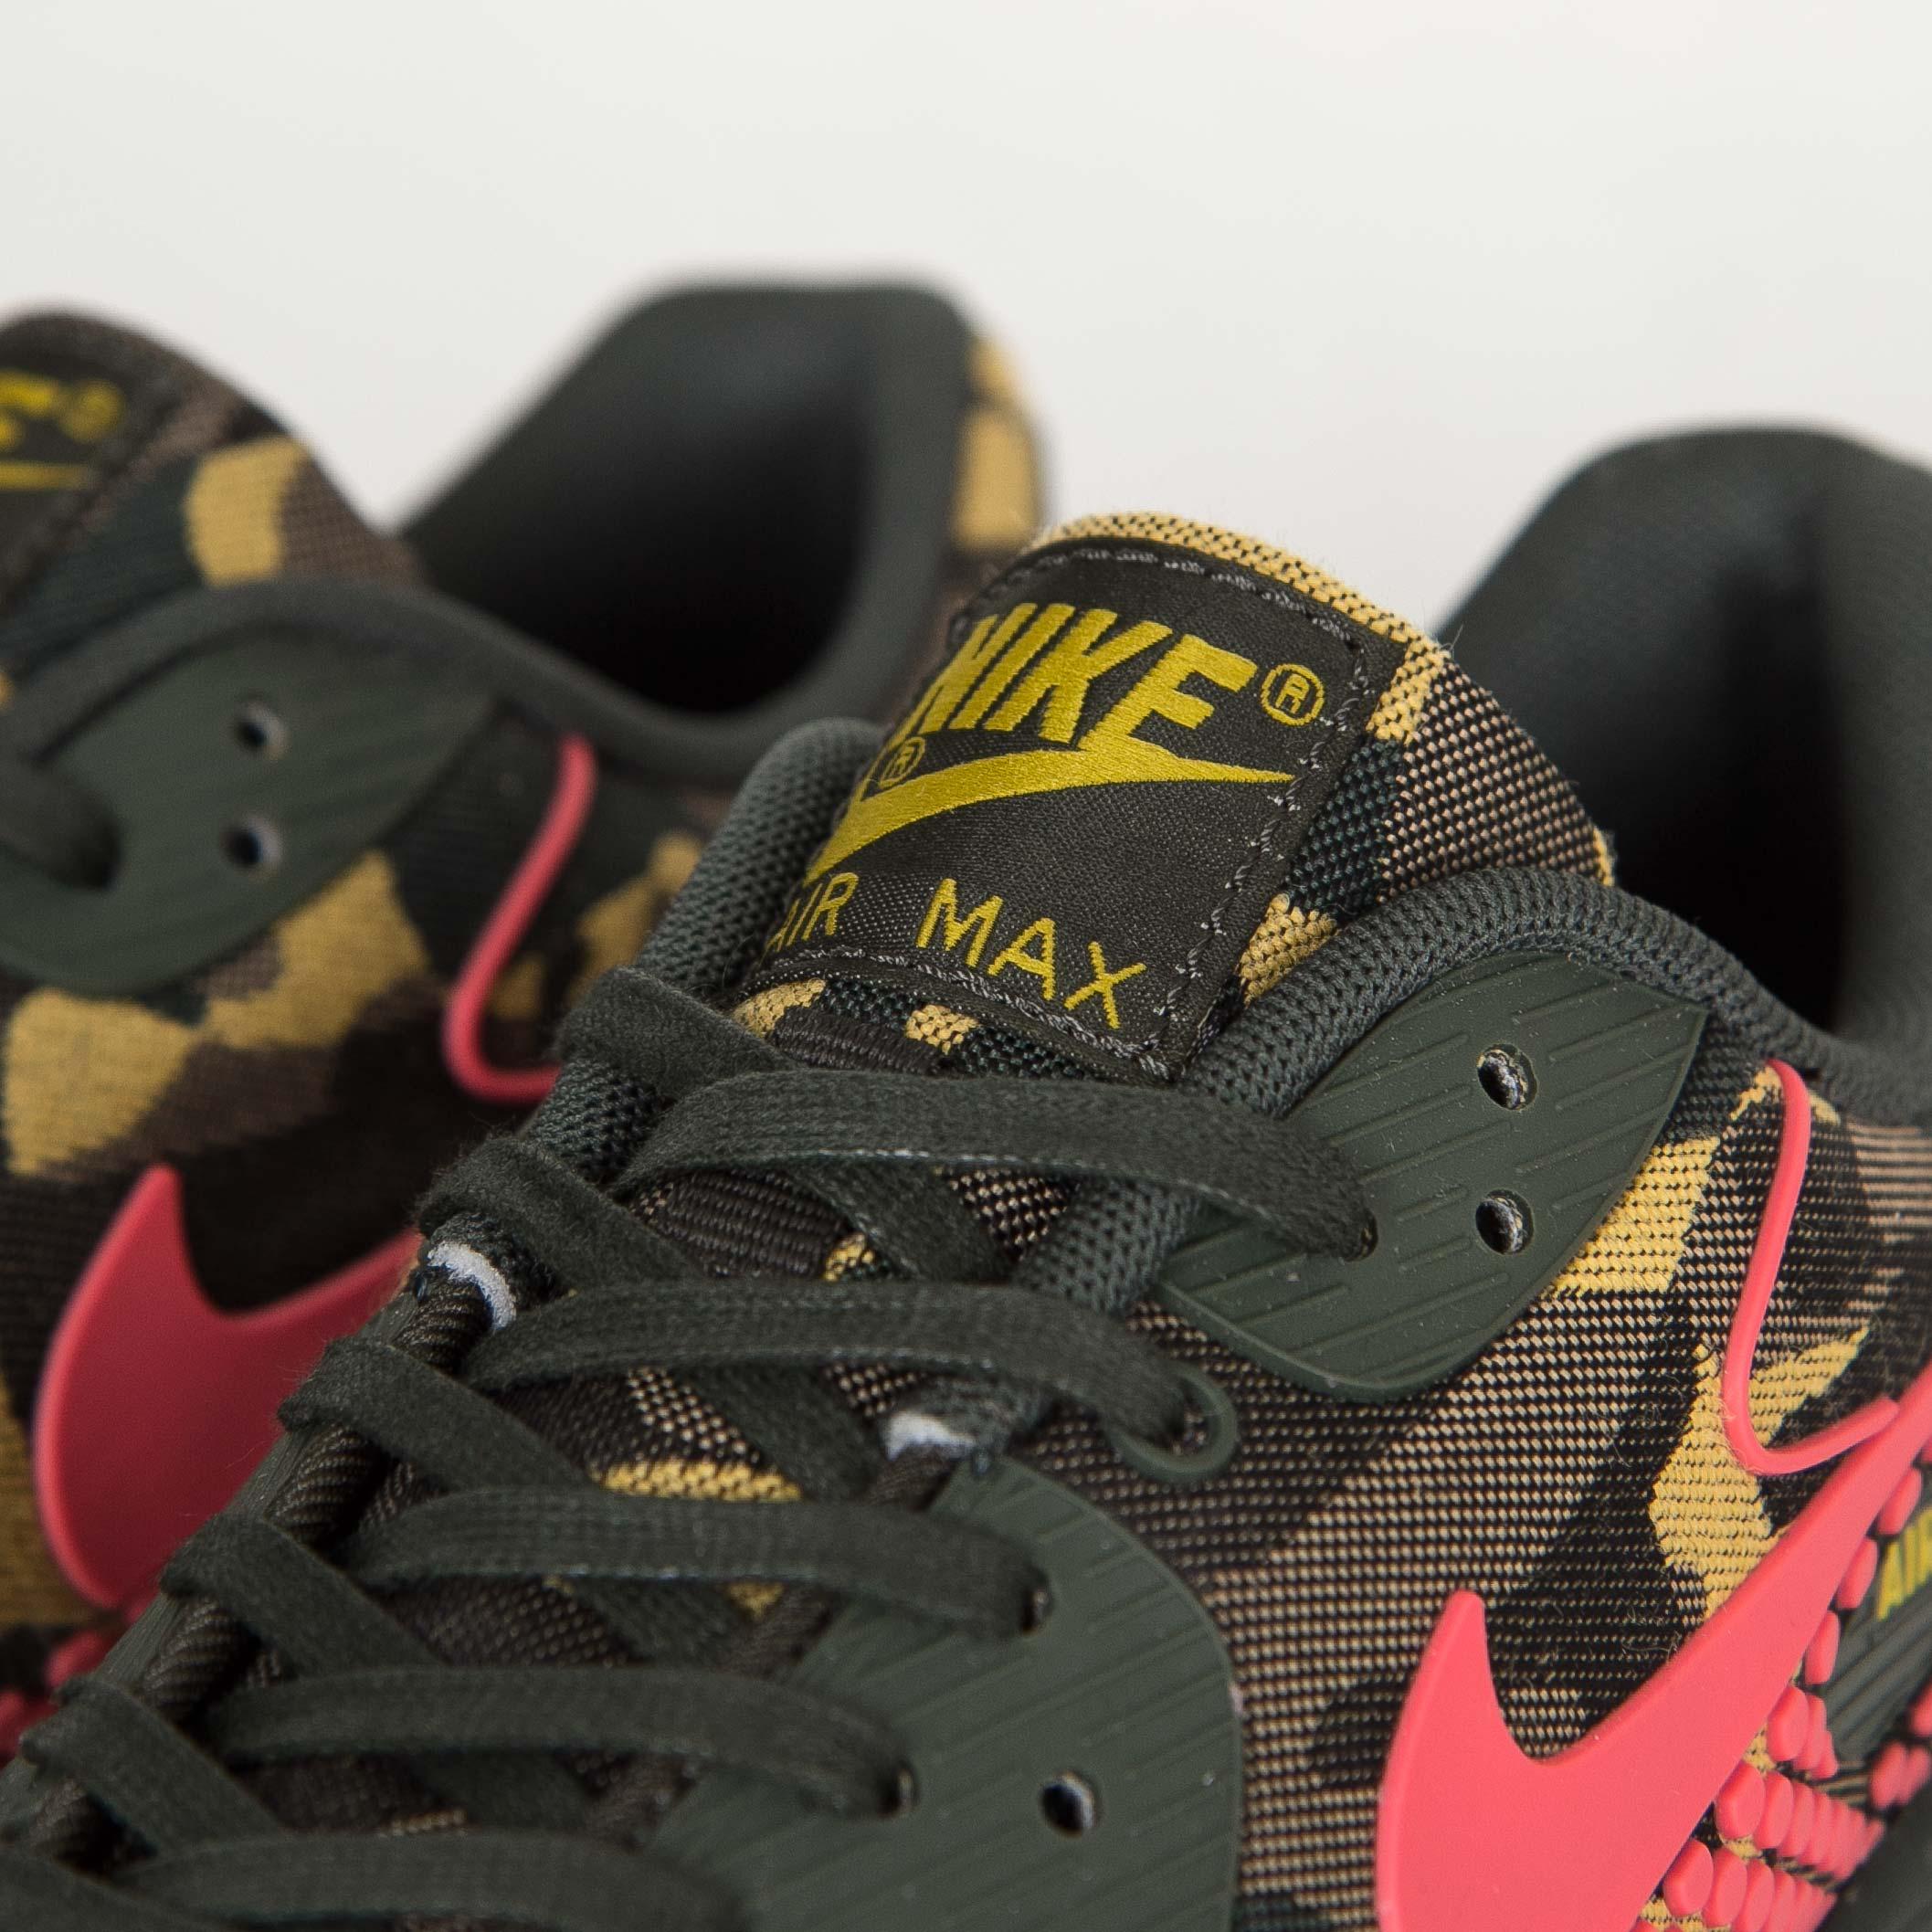 save off 447f2 84867 Nike W Air Max 90 Jacquard Premium - 807298-200 - Sneakersnstuff   sneakers    streetwear online since 1999